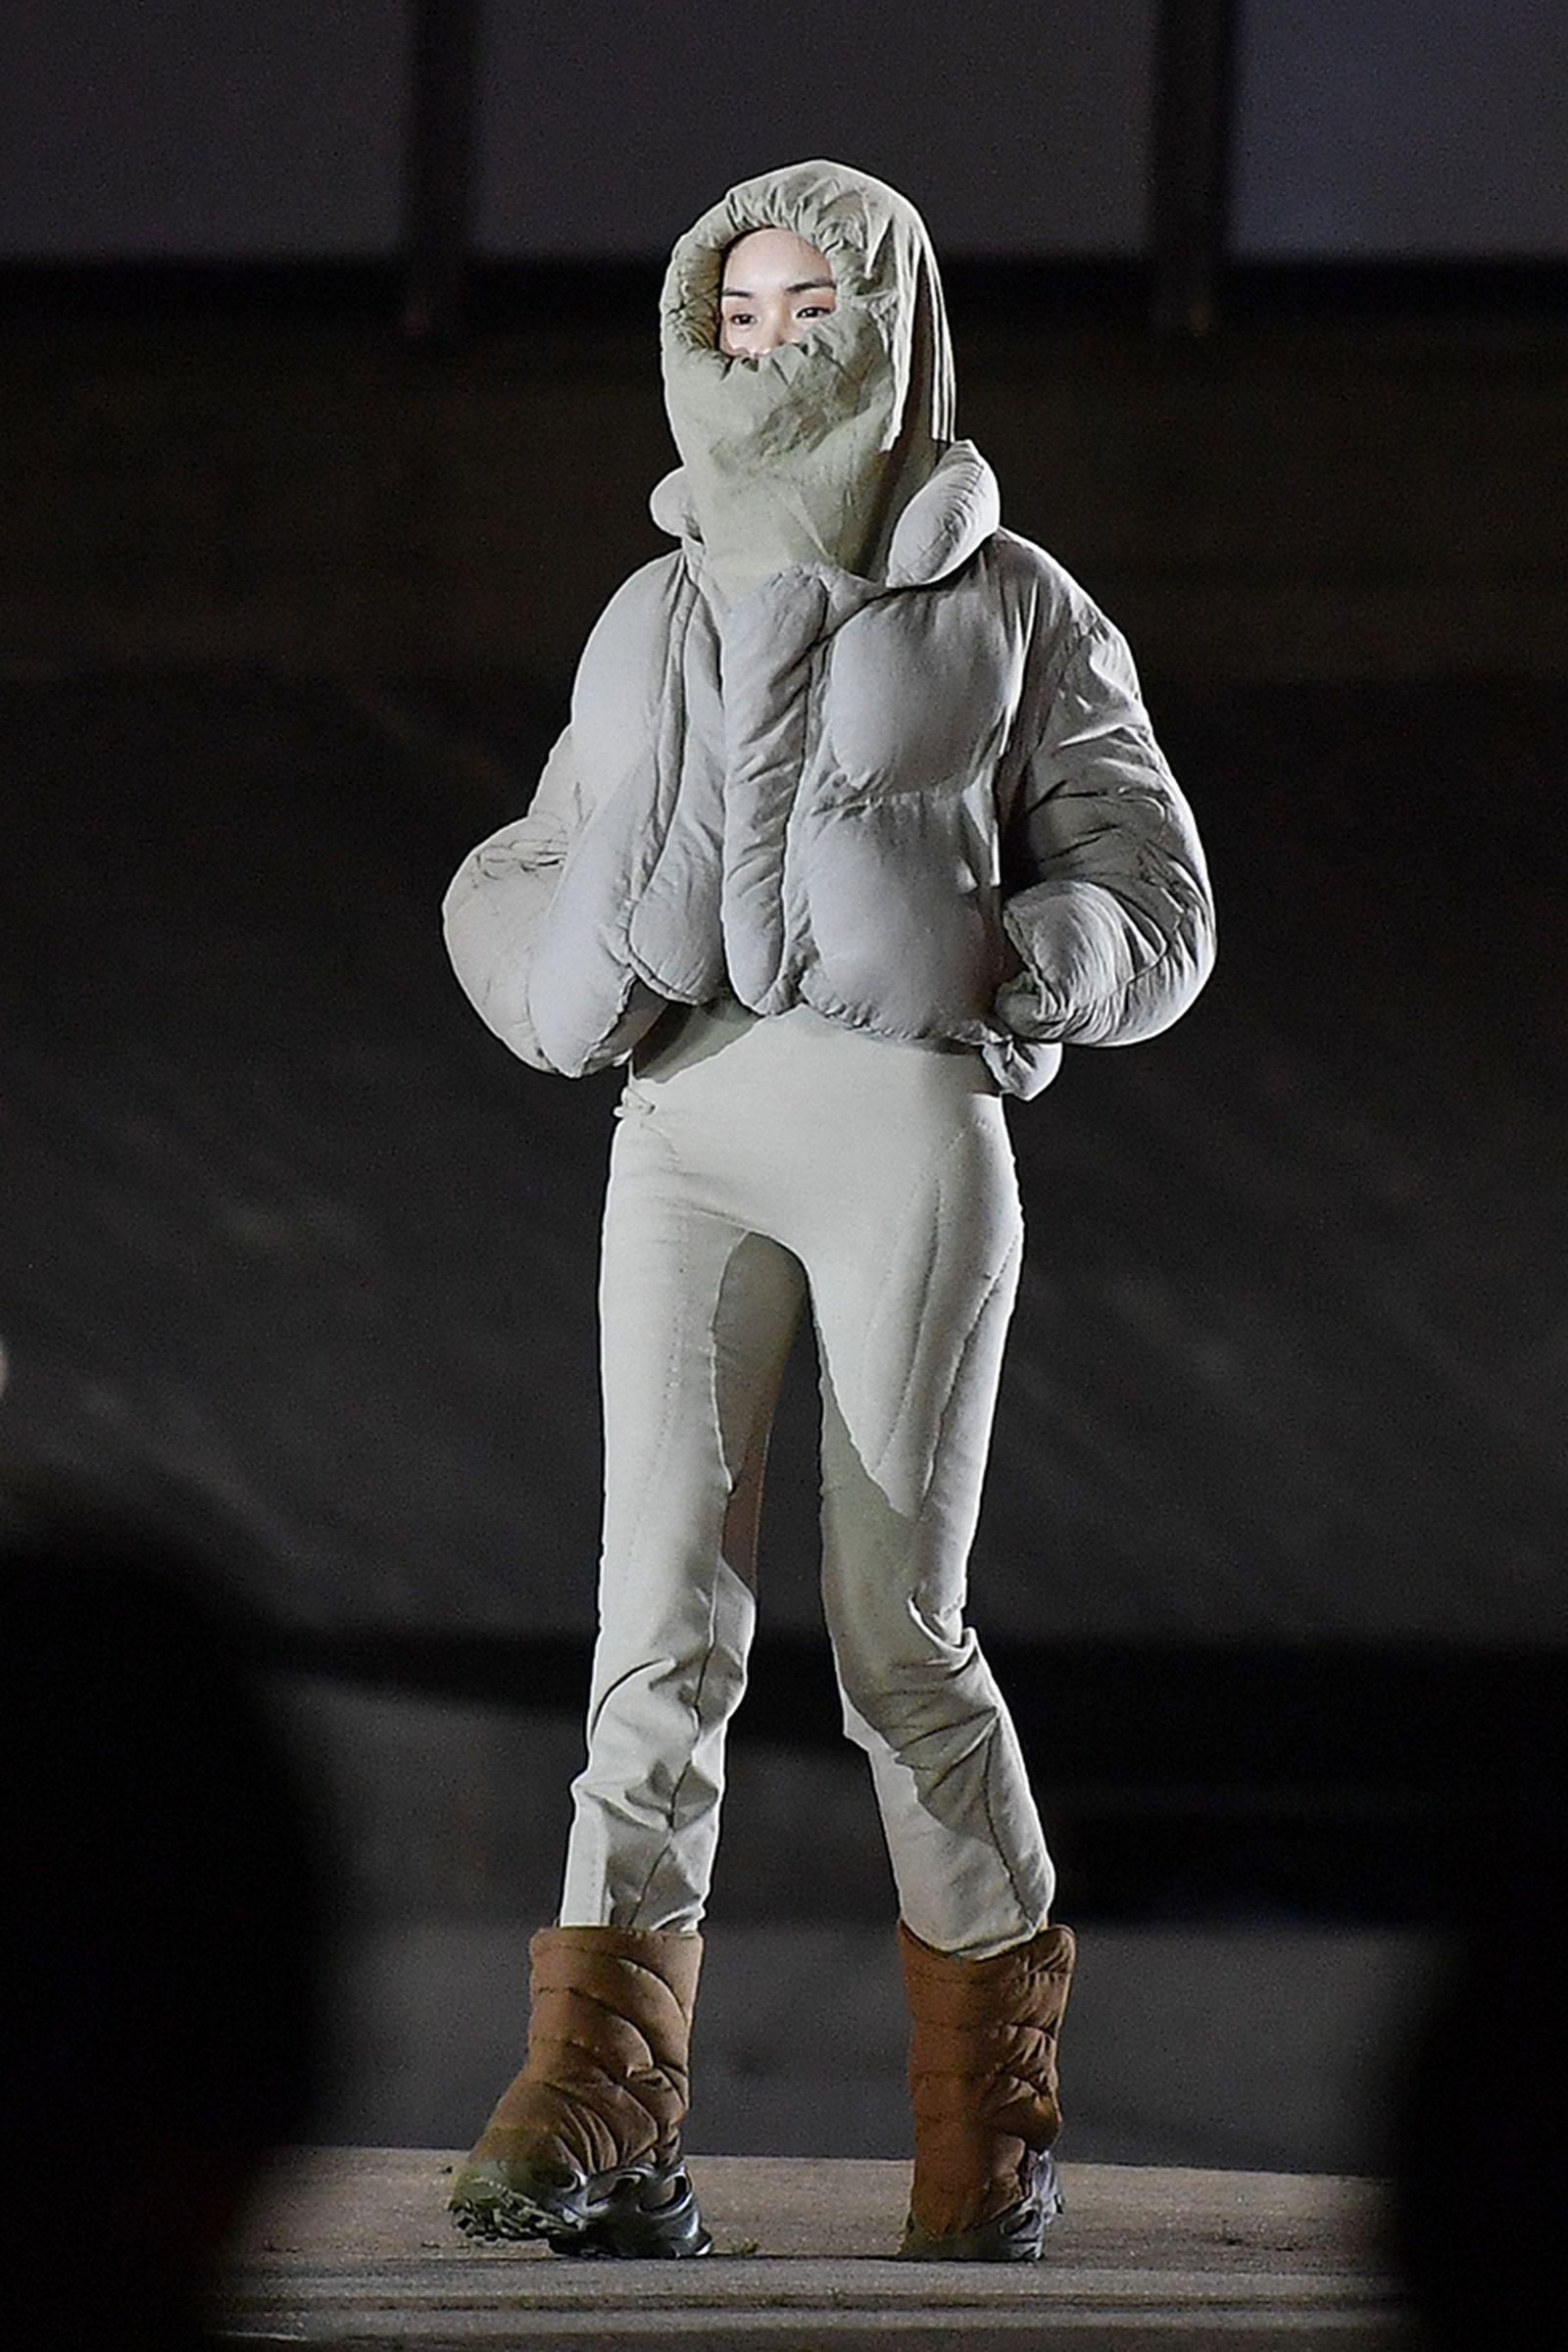 Yeezy Season 8 (Photo by Stephane Cardinale - Corbis/Corbis via Getty Images)